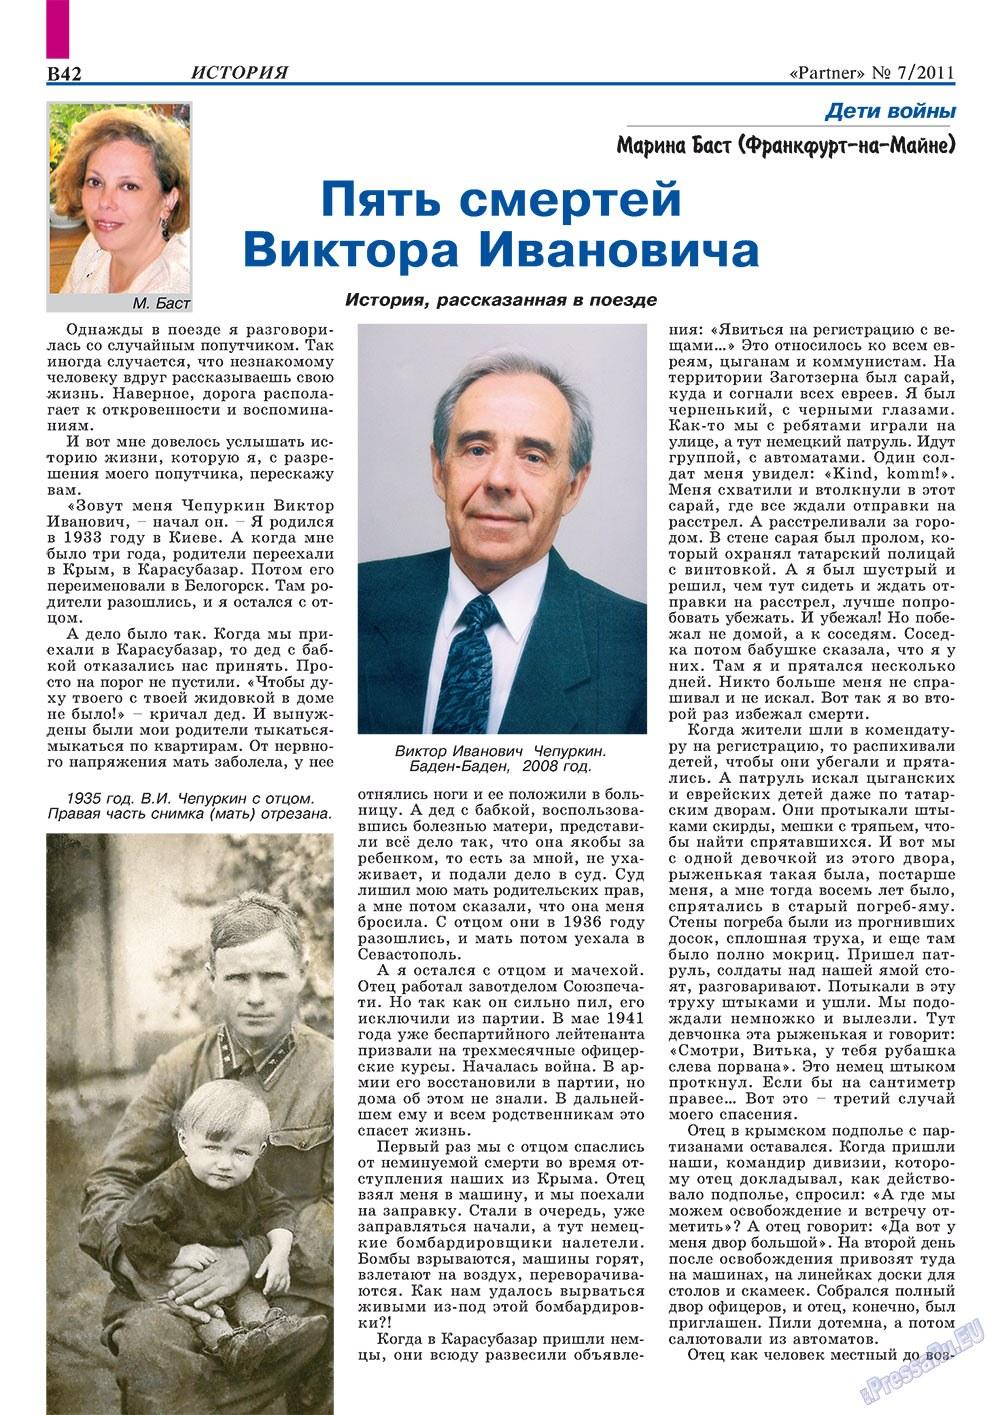 Партнер-север (журнал). 2011 год, номер 7, стр. 52